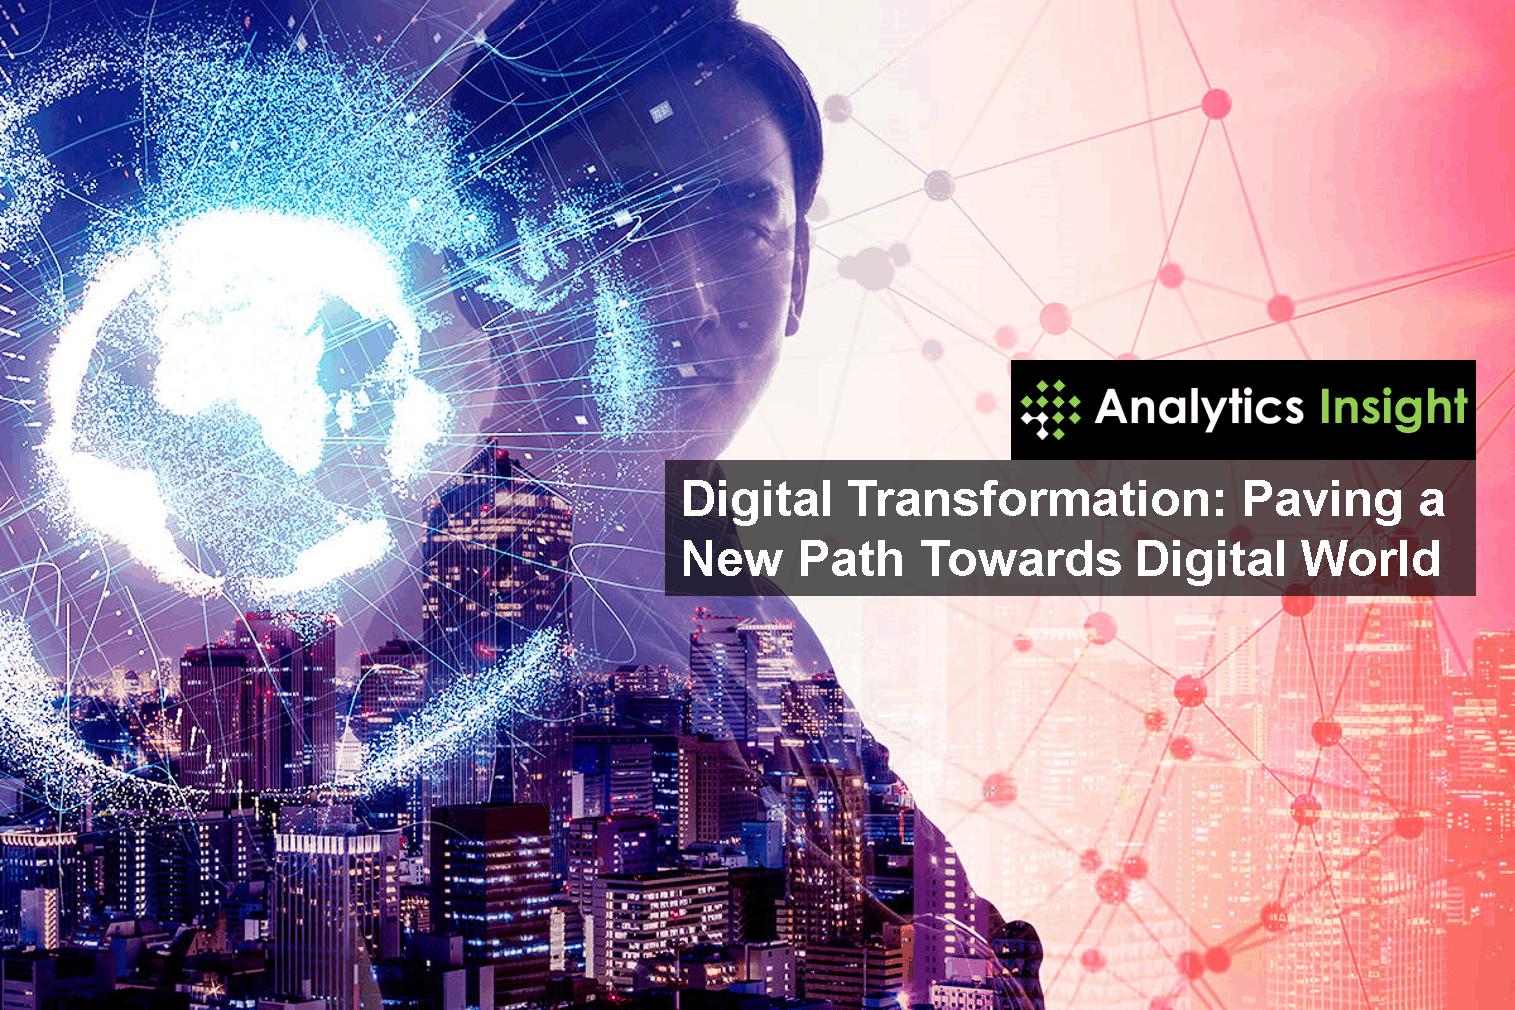 Digital Transformation: Paving a New Path Towards Digital World